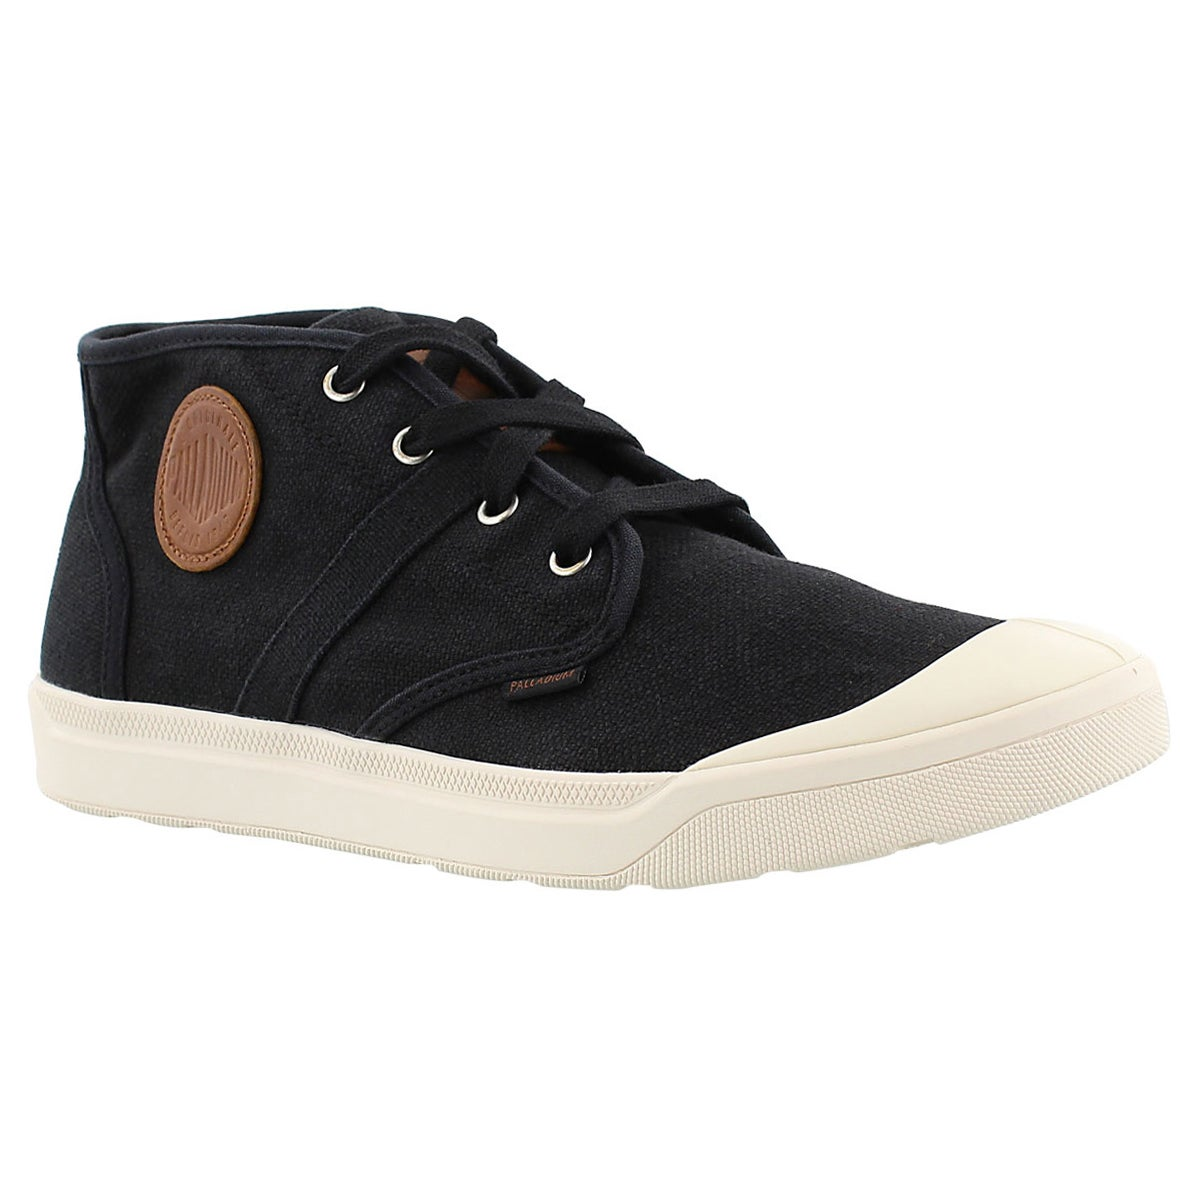 Men's PALLARUE MID black sneakers